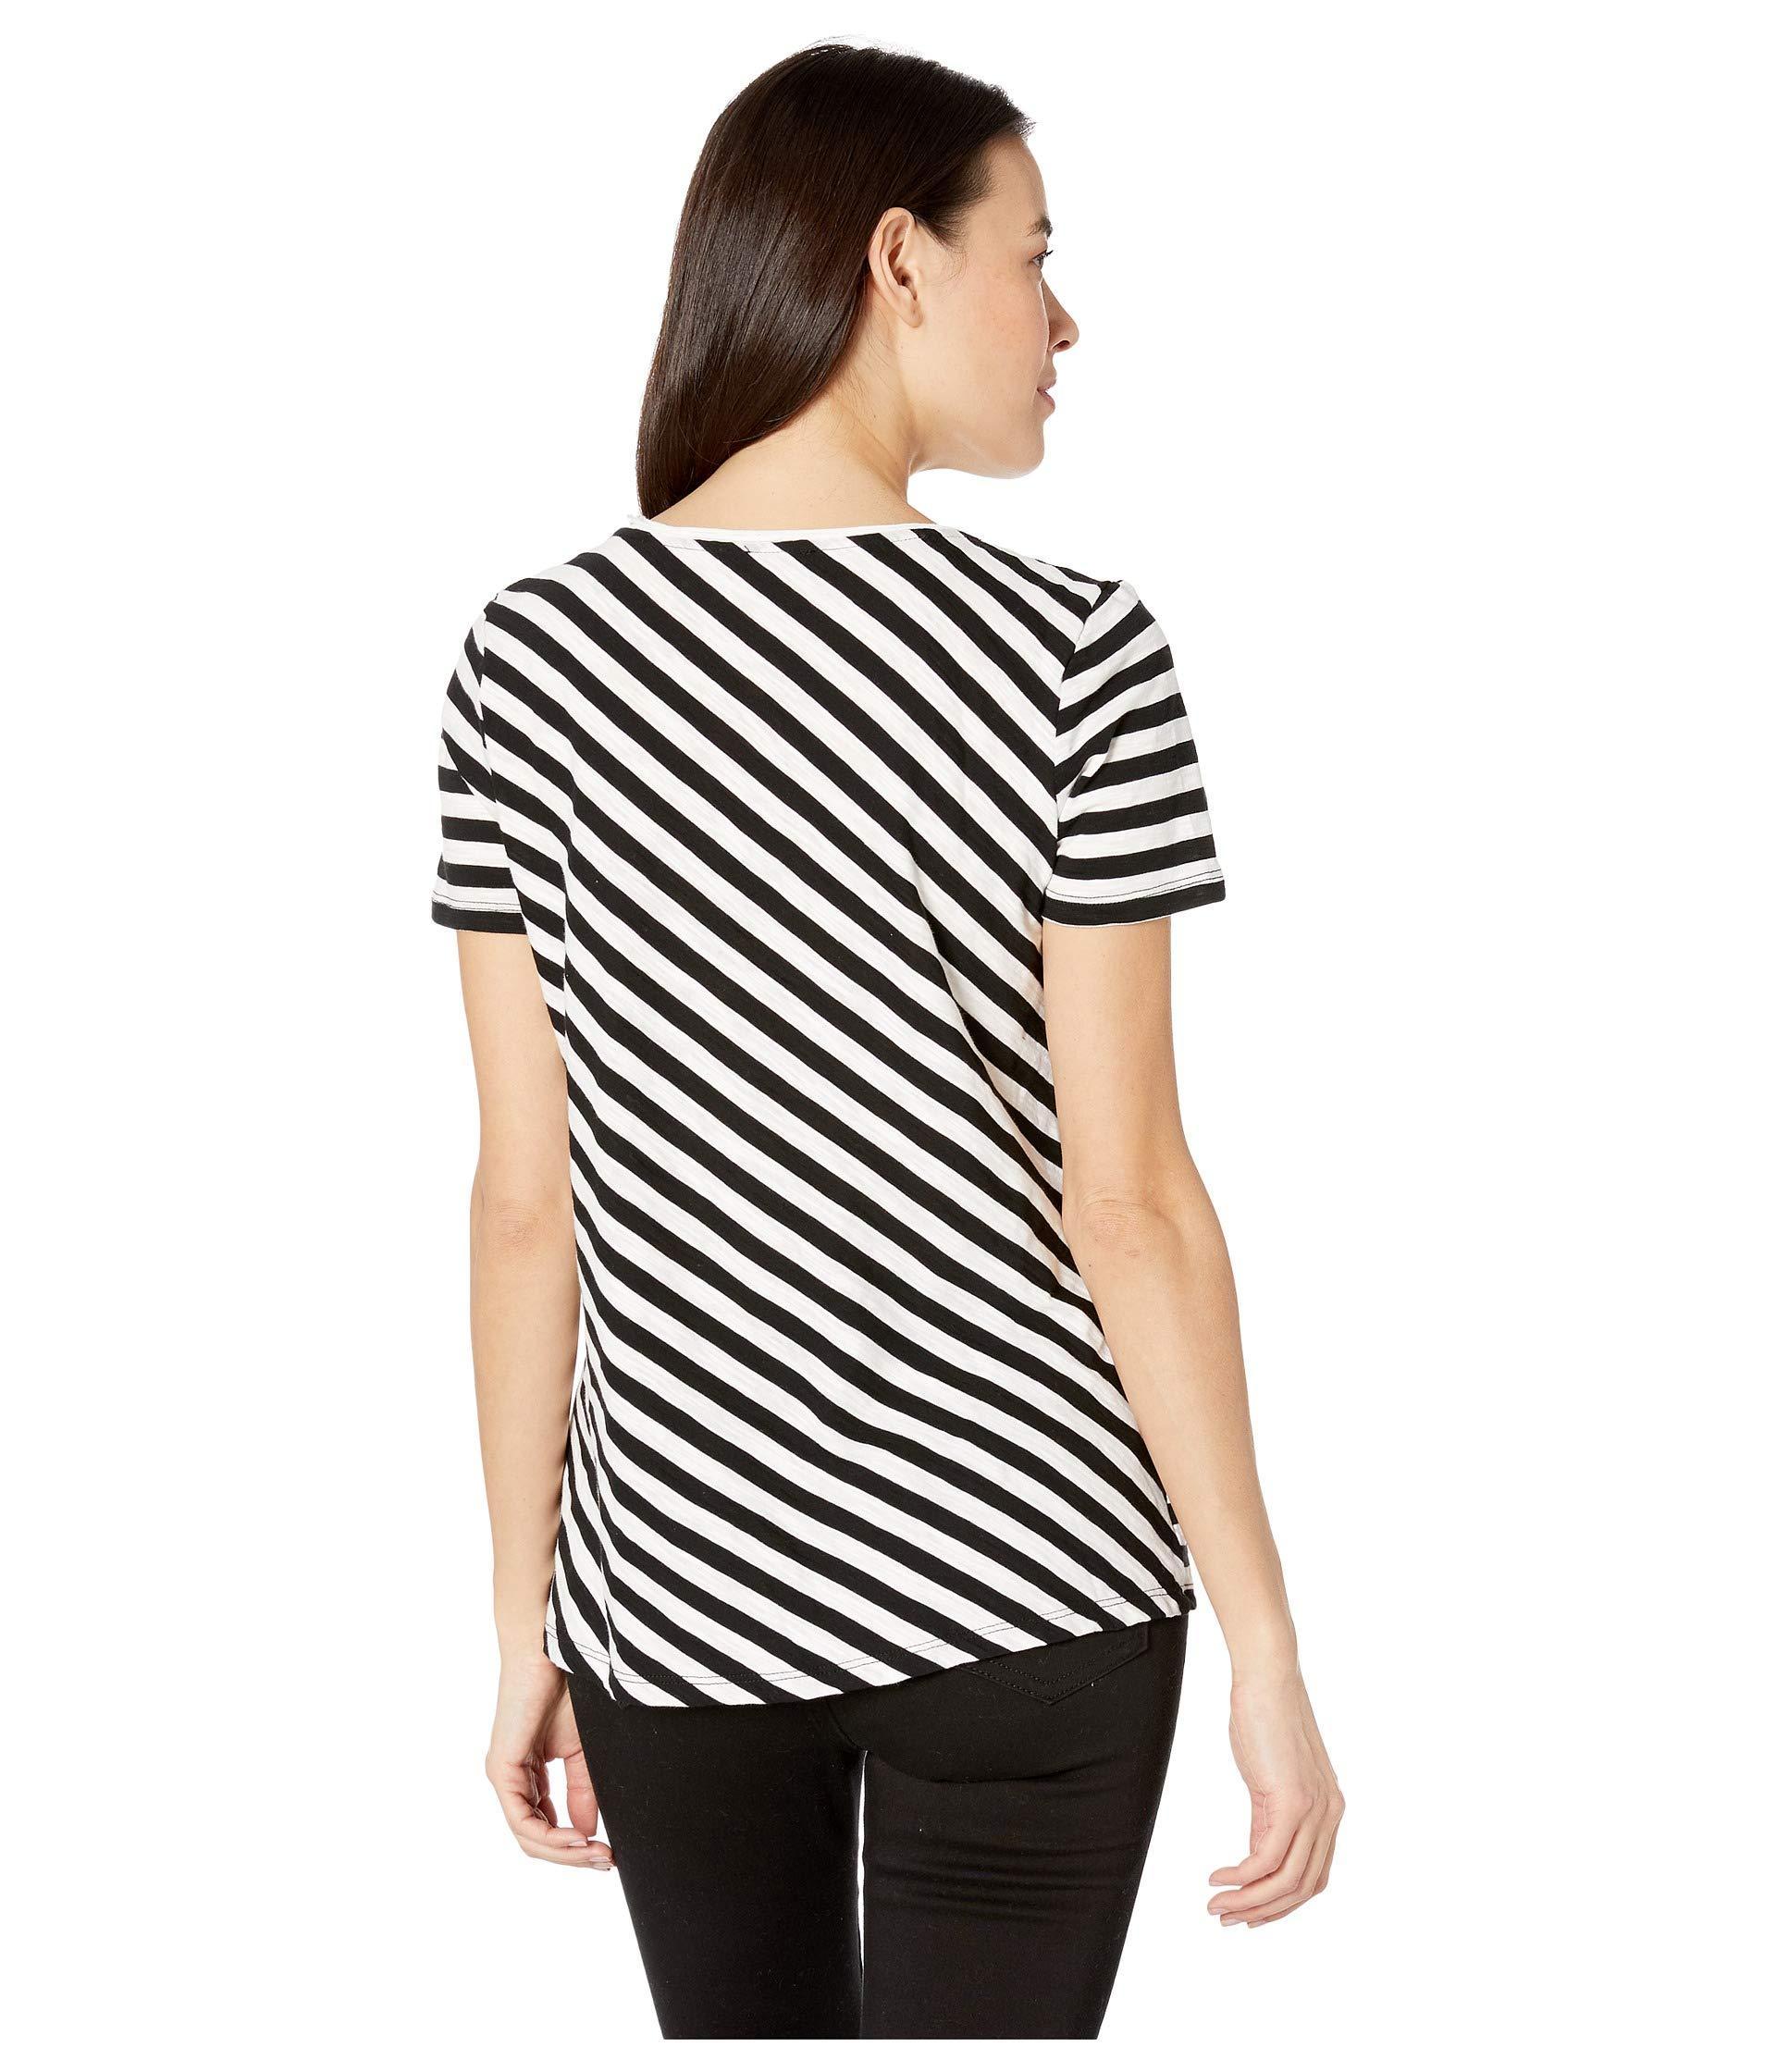 aaba8de859 ... Short Sleeve Amour City Stripe Scoop Neck Tee (rich Black. View  fullscreen